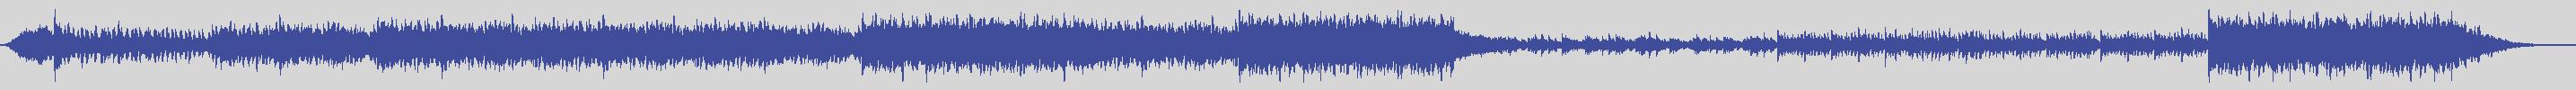 just_digital_records [JS1224] Nikon - The Phoenix [Original Mix] audio wave form